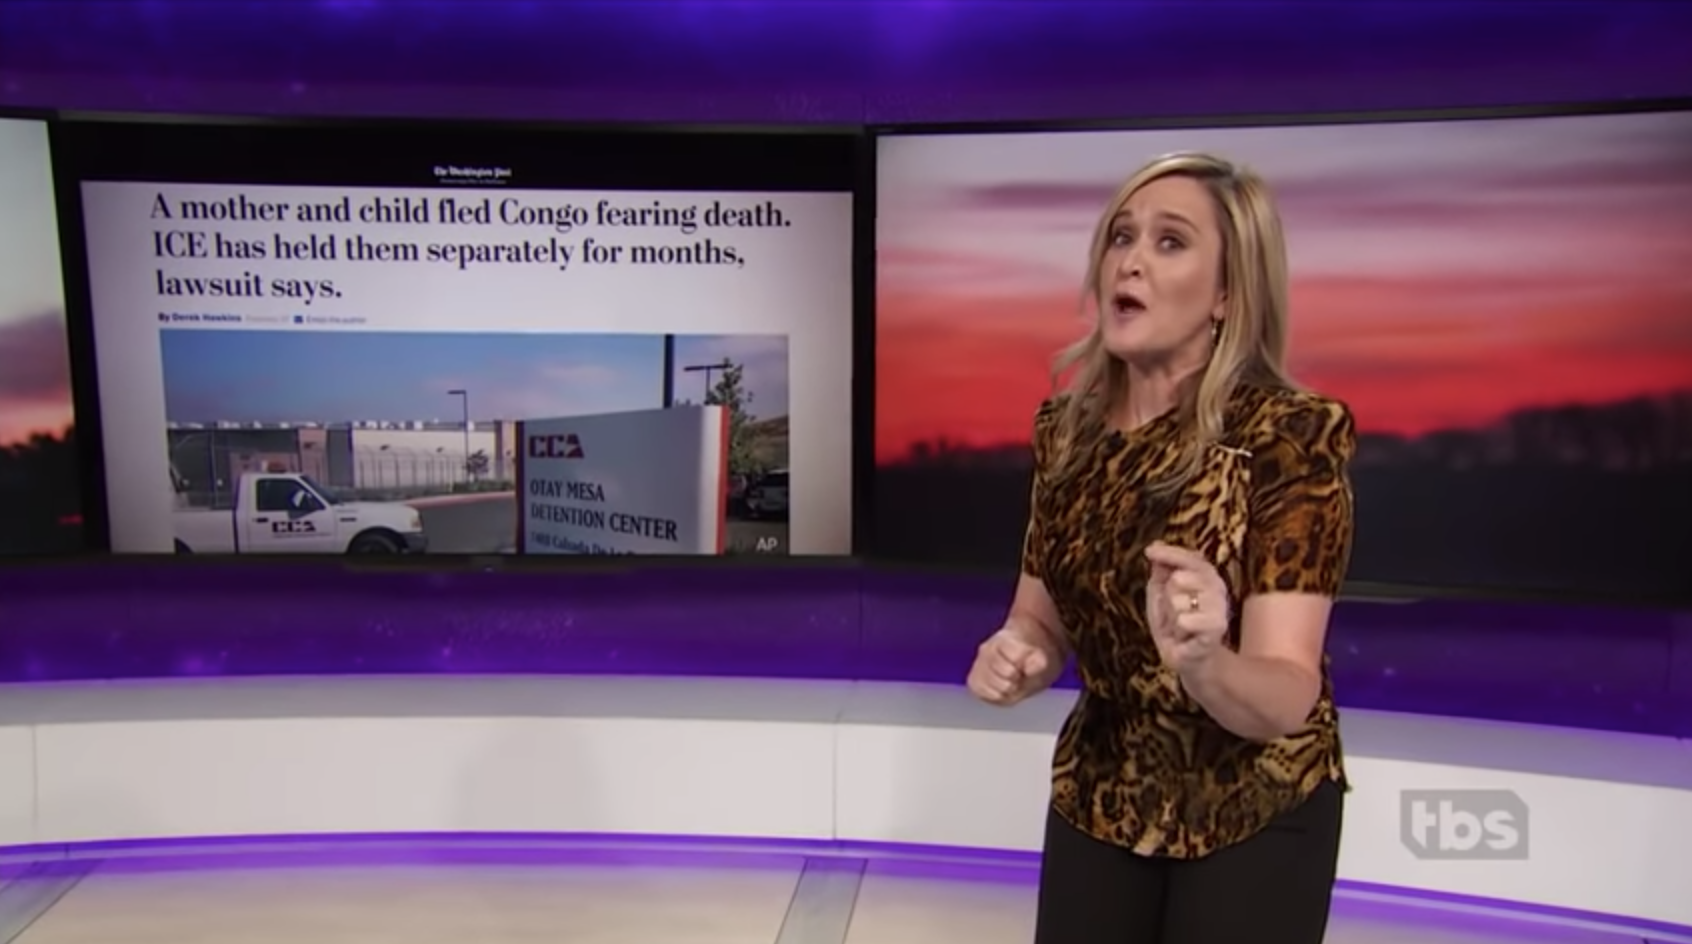 Samantha Bee on her show, criticizing Ivanka Trump